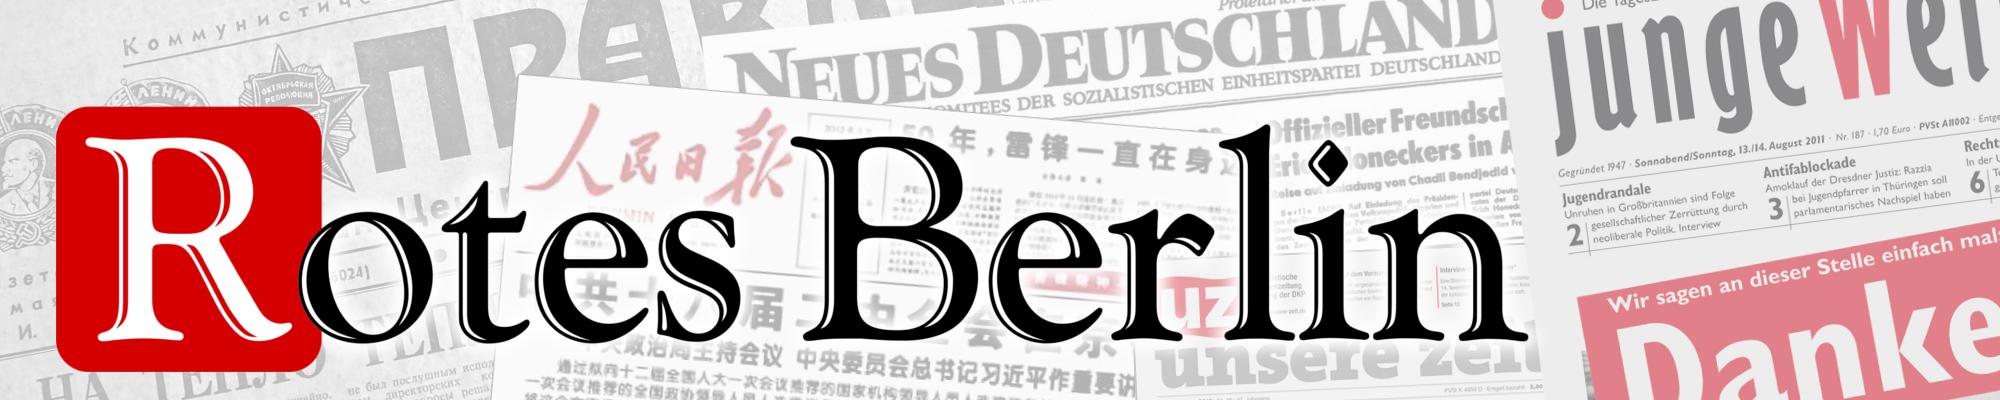 Rotes Berlin